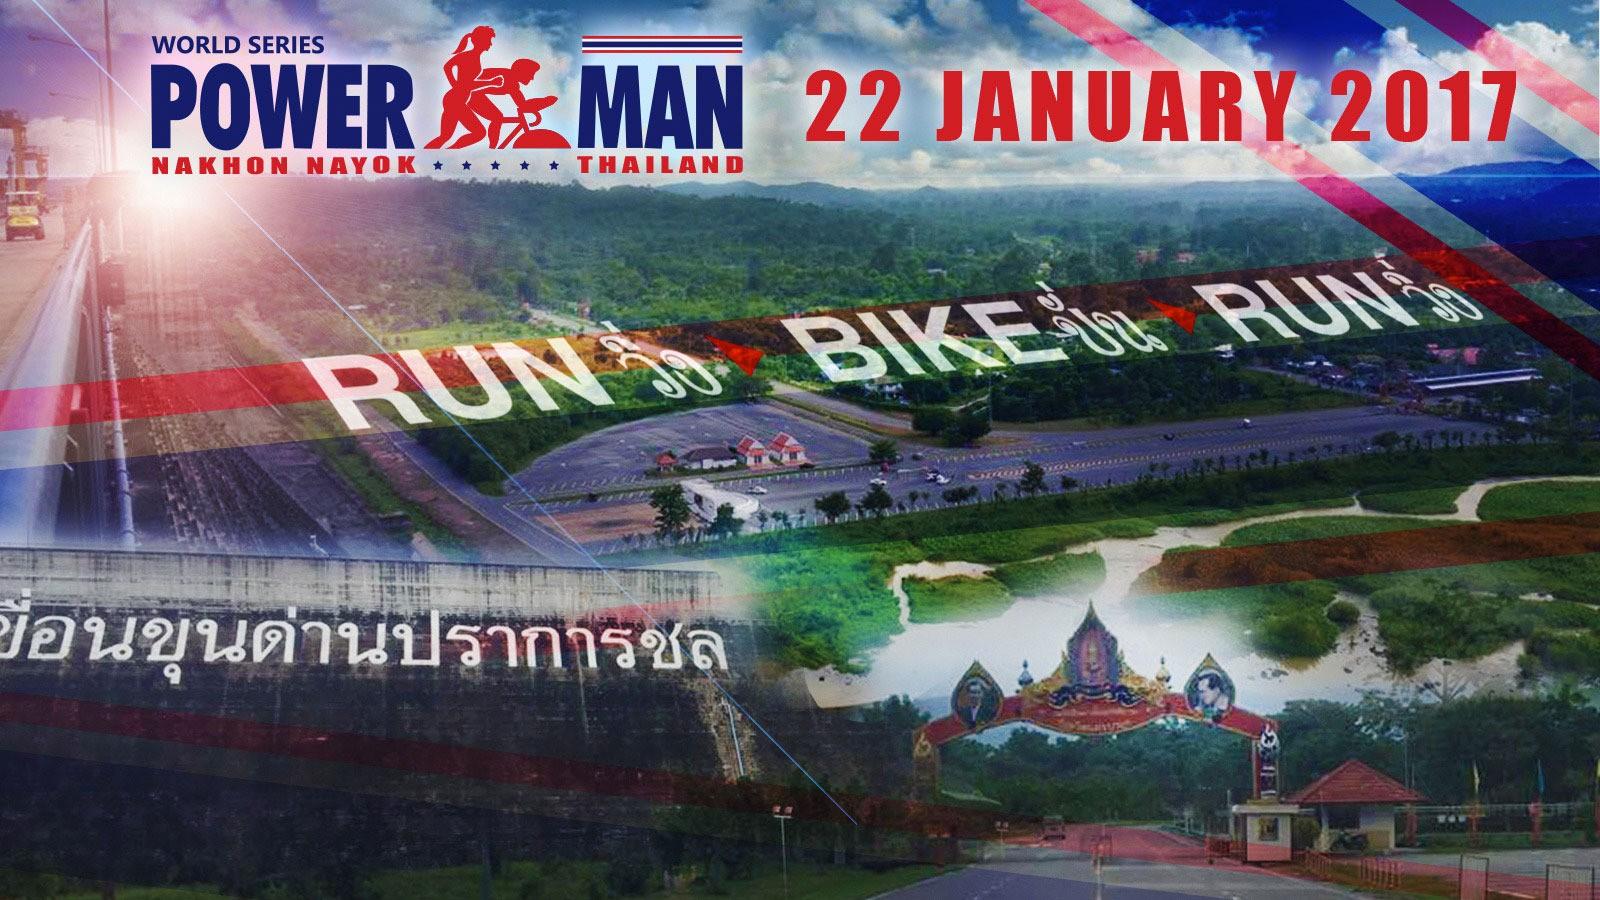 powerman-nakhon-nayok-2017-thailand-1600